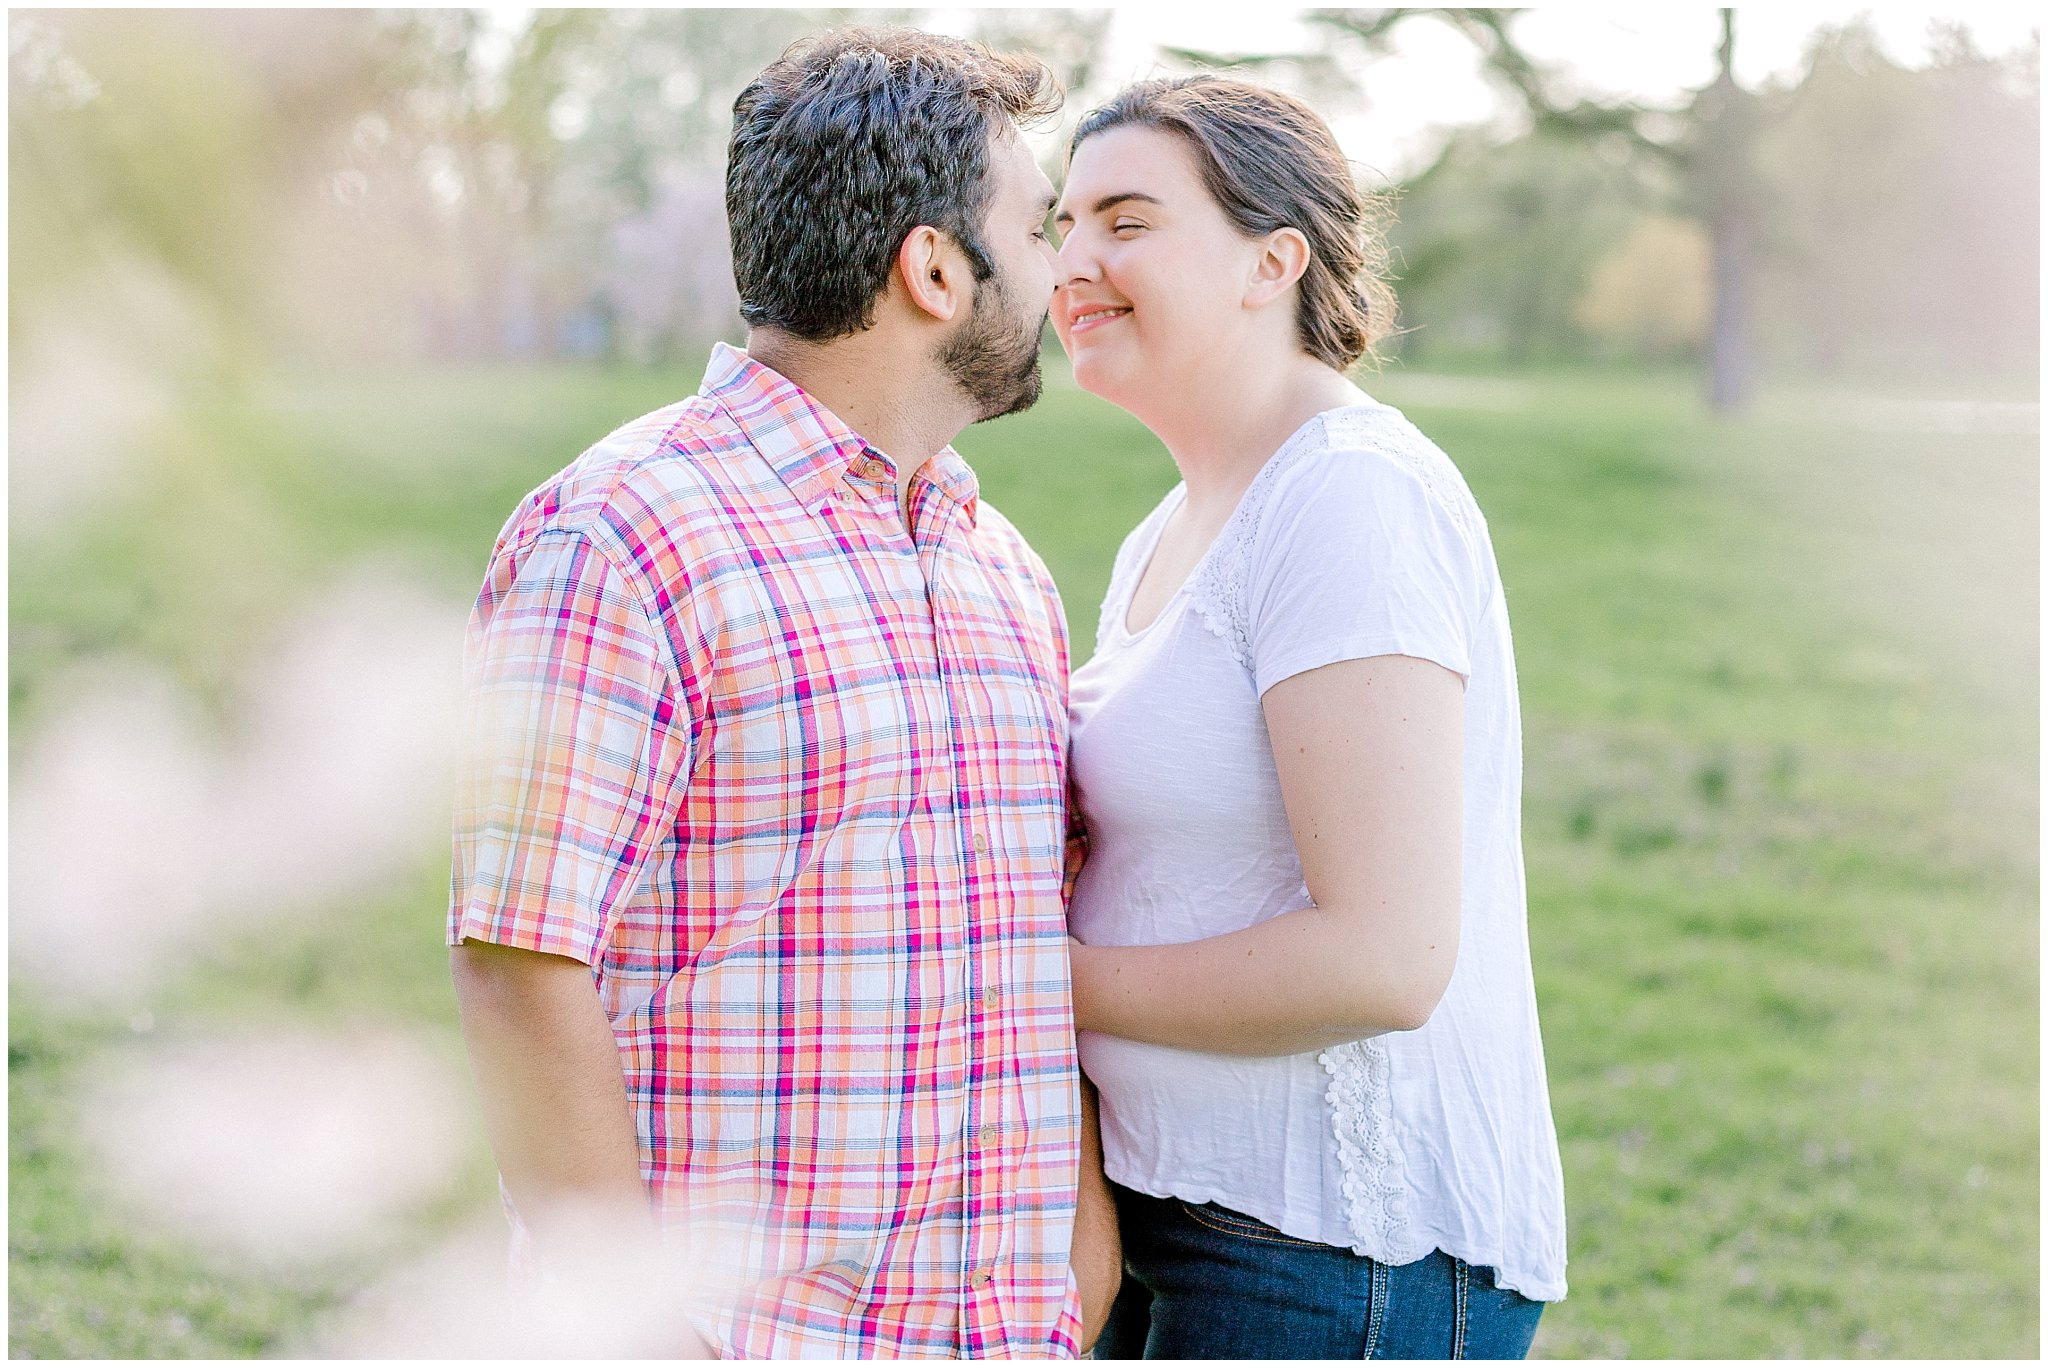 Lehigh Valley Spring Cherry Blossom Engagement Session Pennsylvania Wedding Photographer (18).jpg